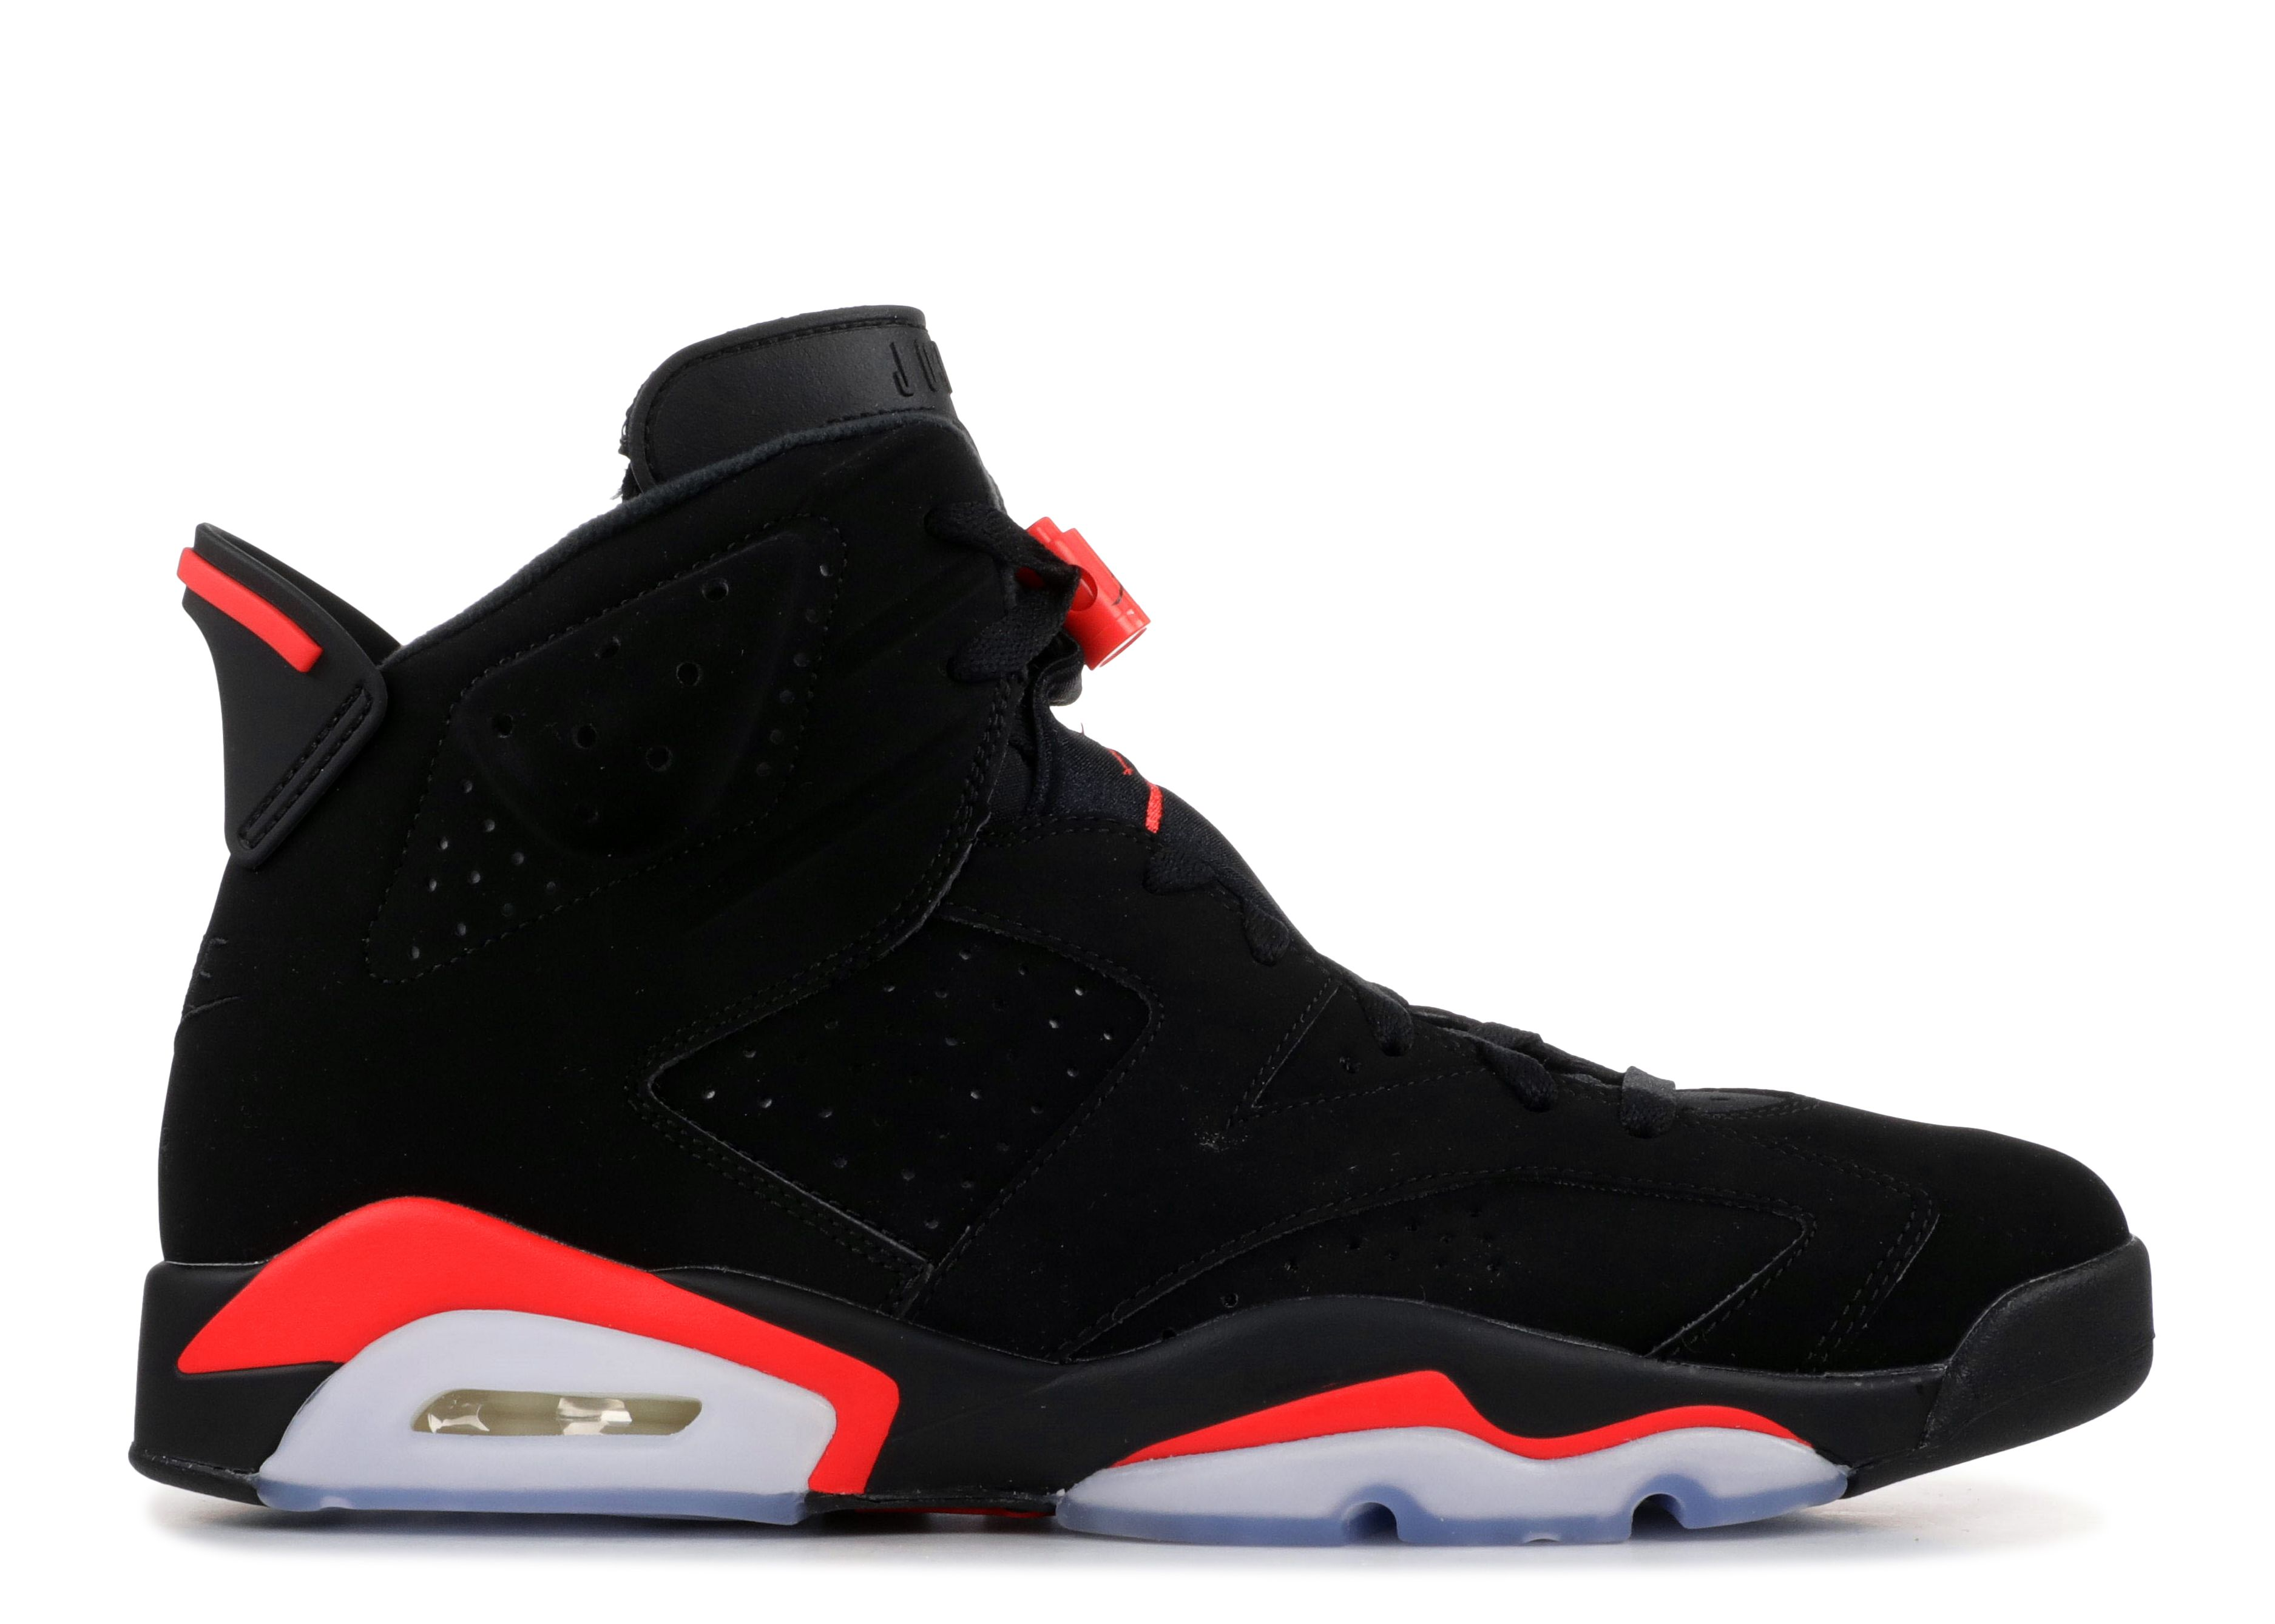 Air Jordan 6 Retro Infrared 2019 Air Jordan 384664 060 Black Infrared 23 Black Jordan Shoes For Men Sneakers Men Fashion Jordans Girls